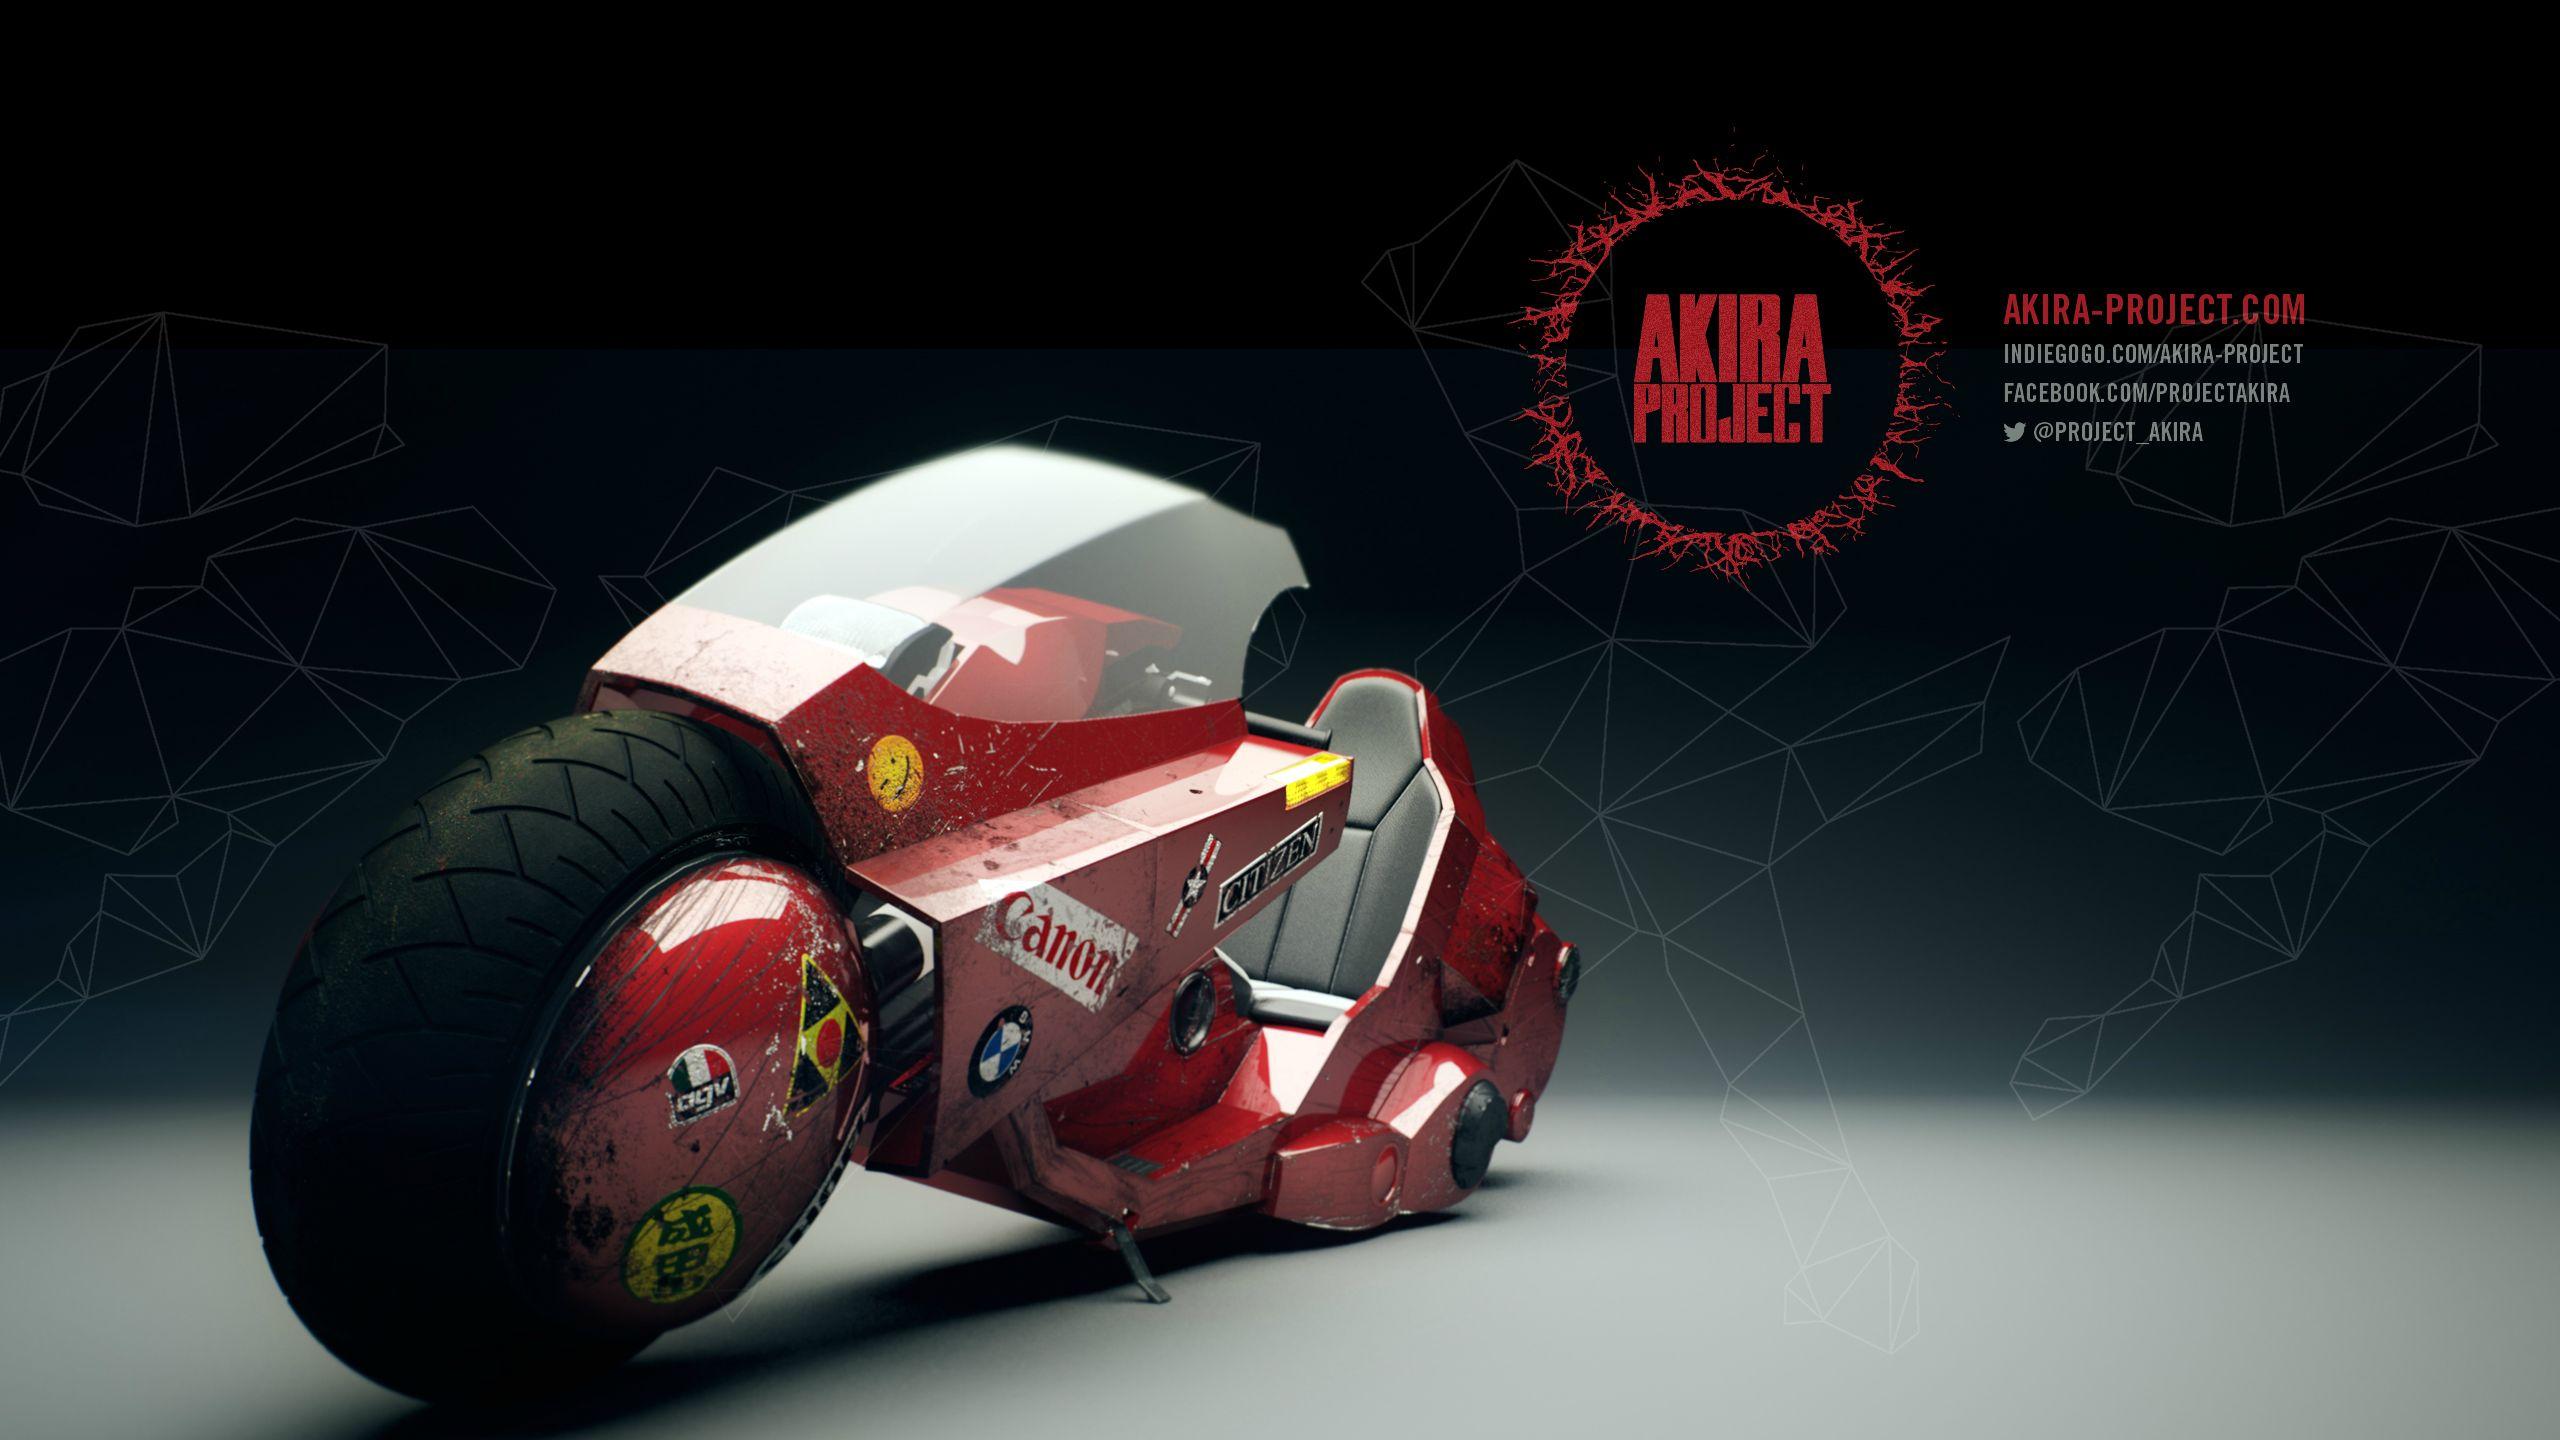 akira-bike